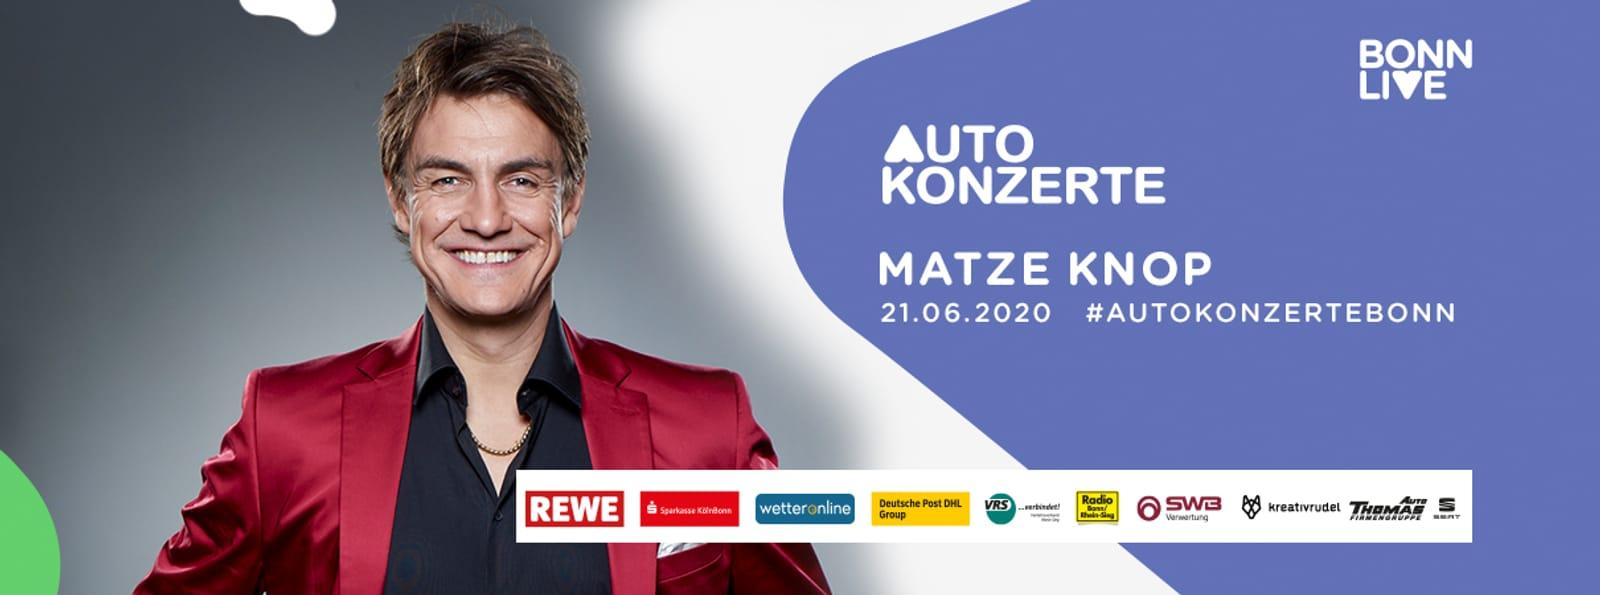 Matze Knop | BonnLive Autokonzerte